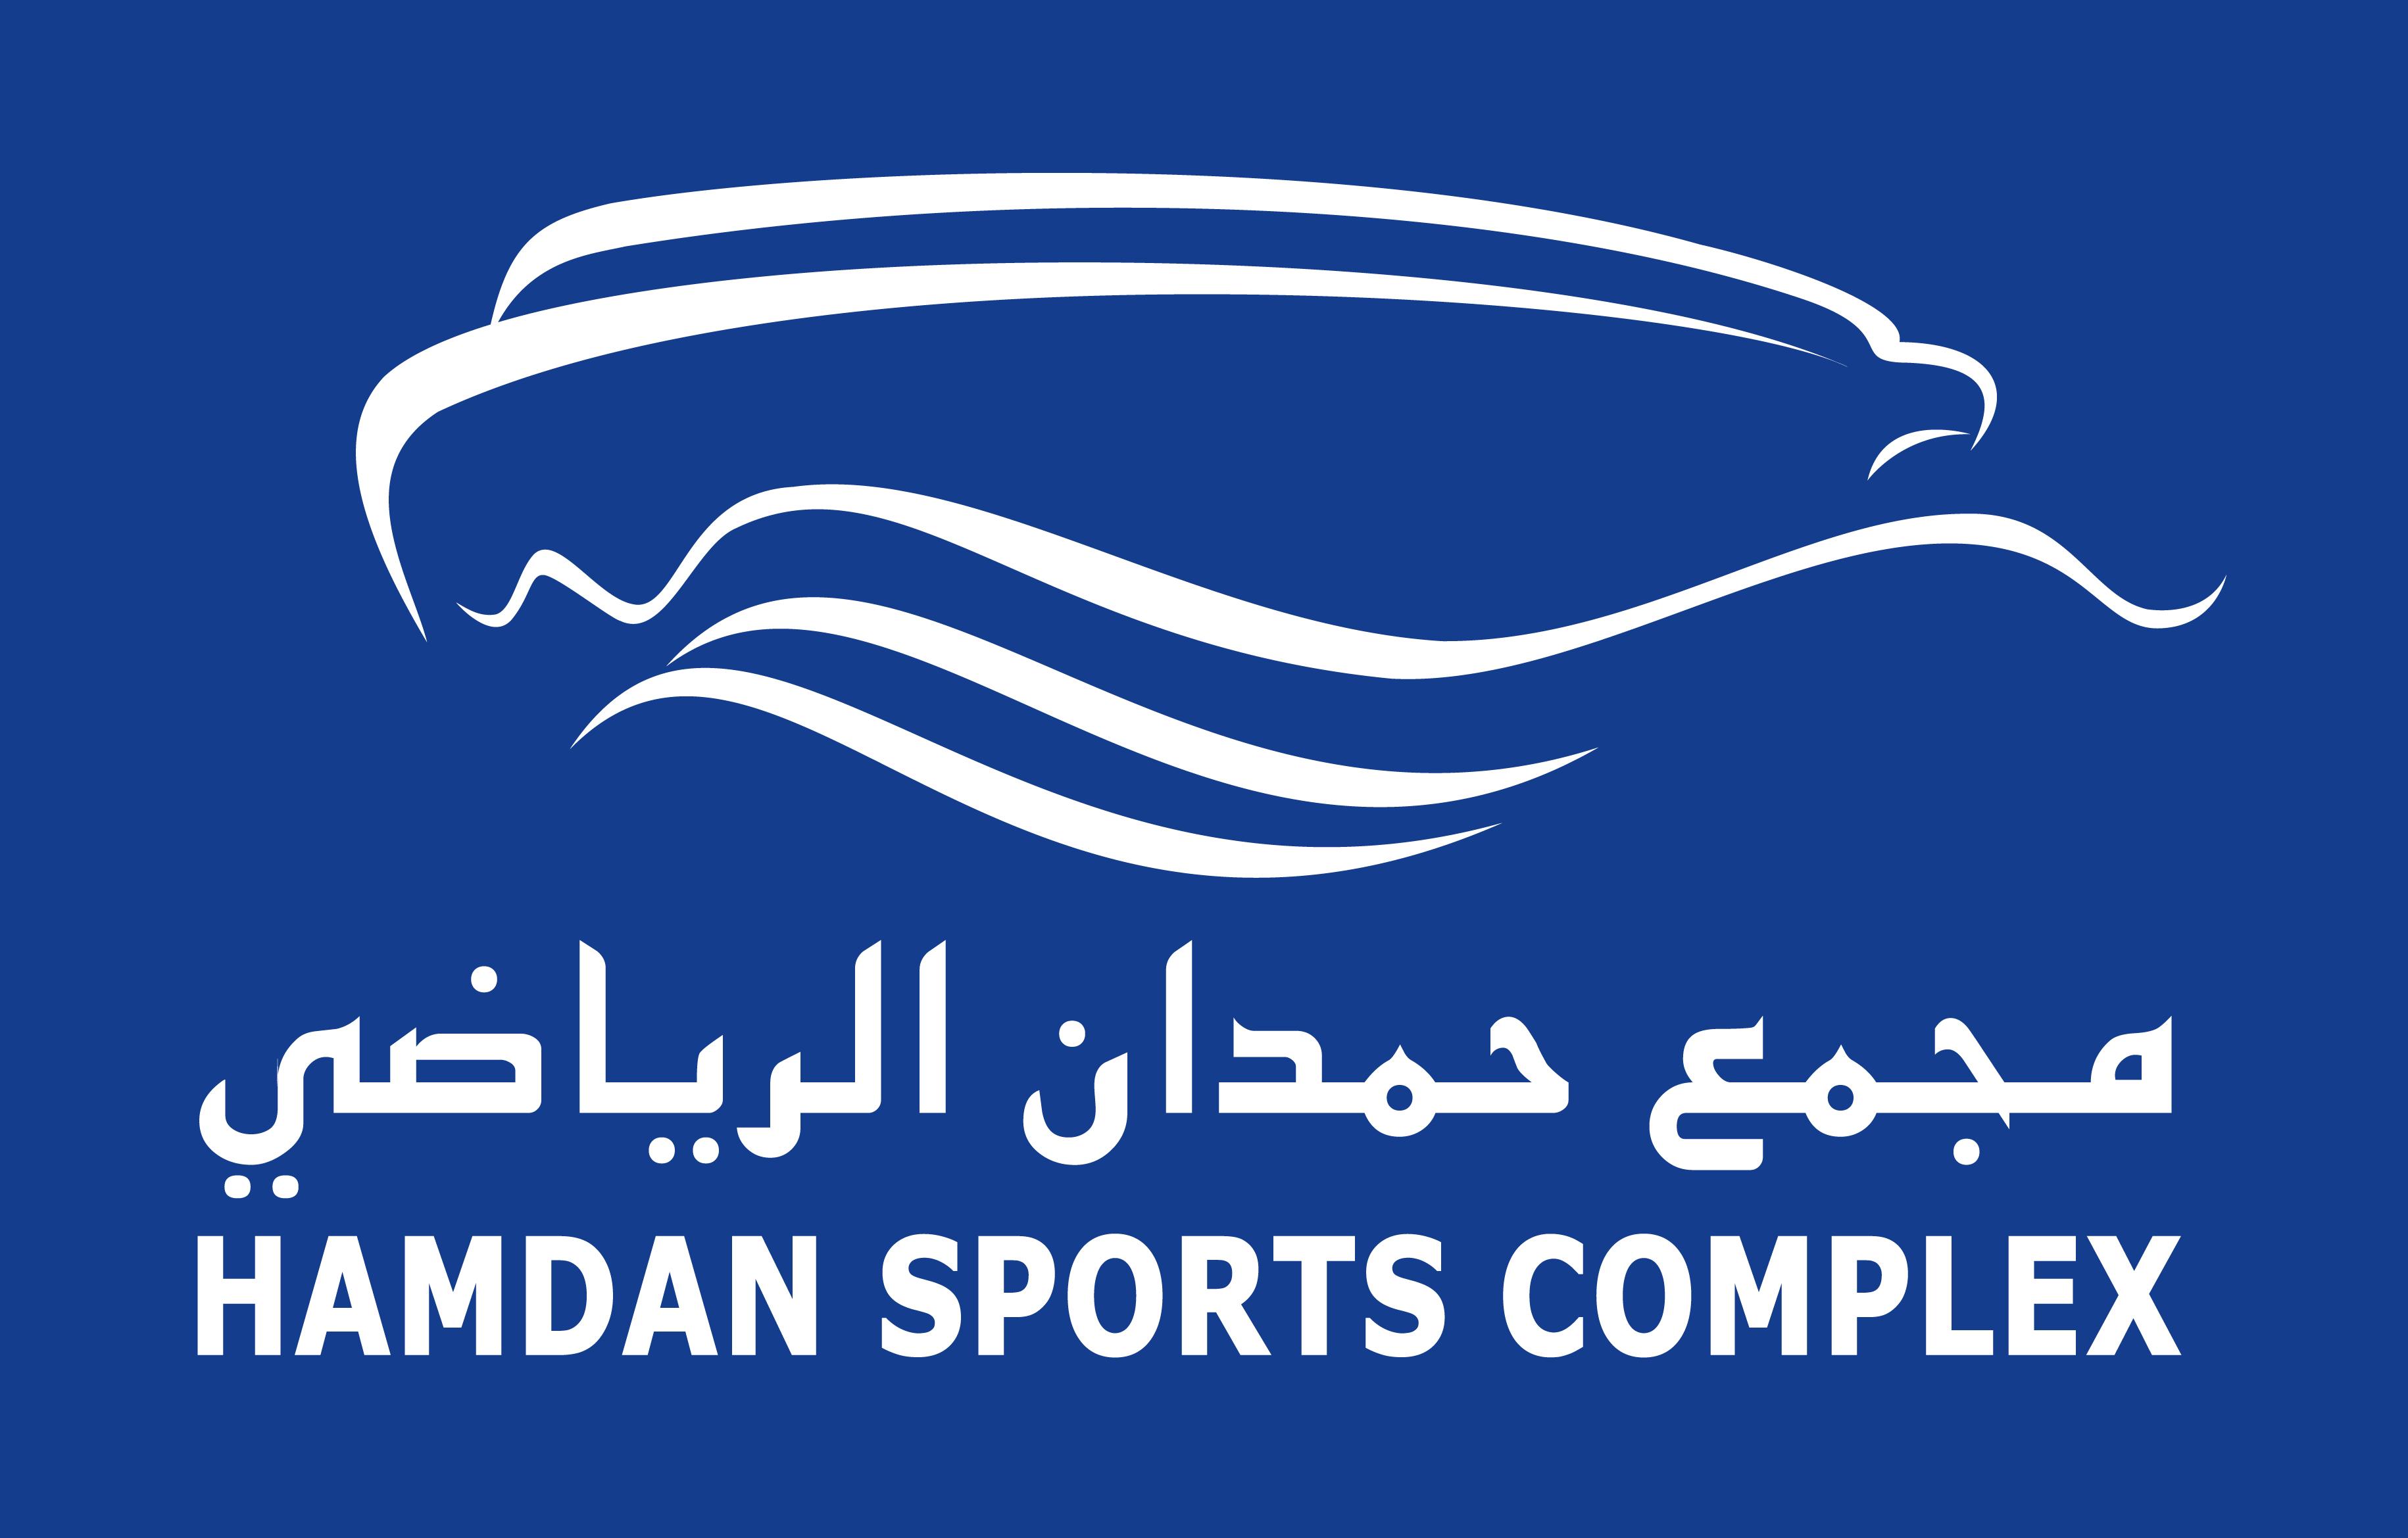 Hamdan Sports Comples